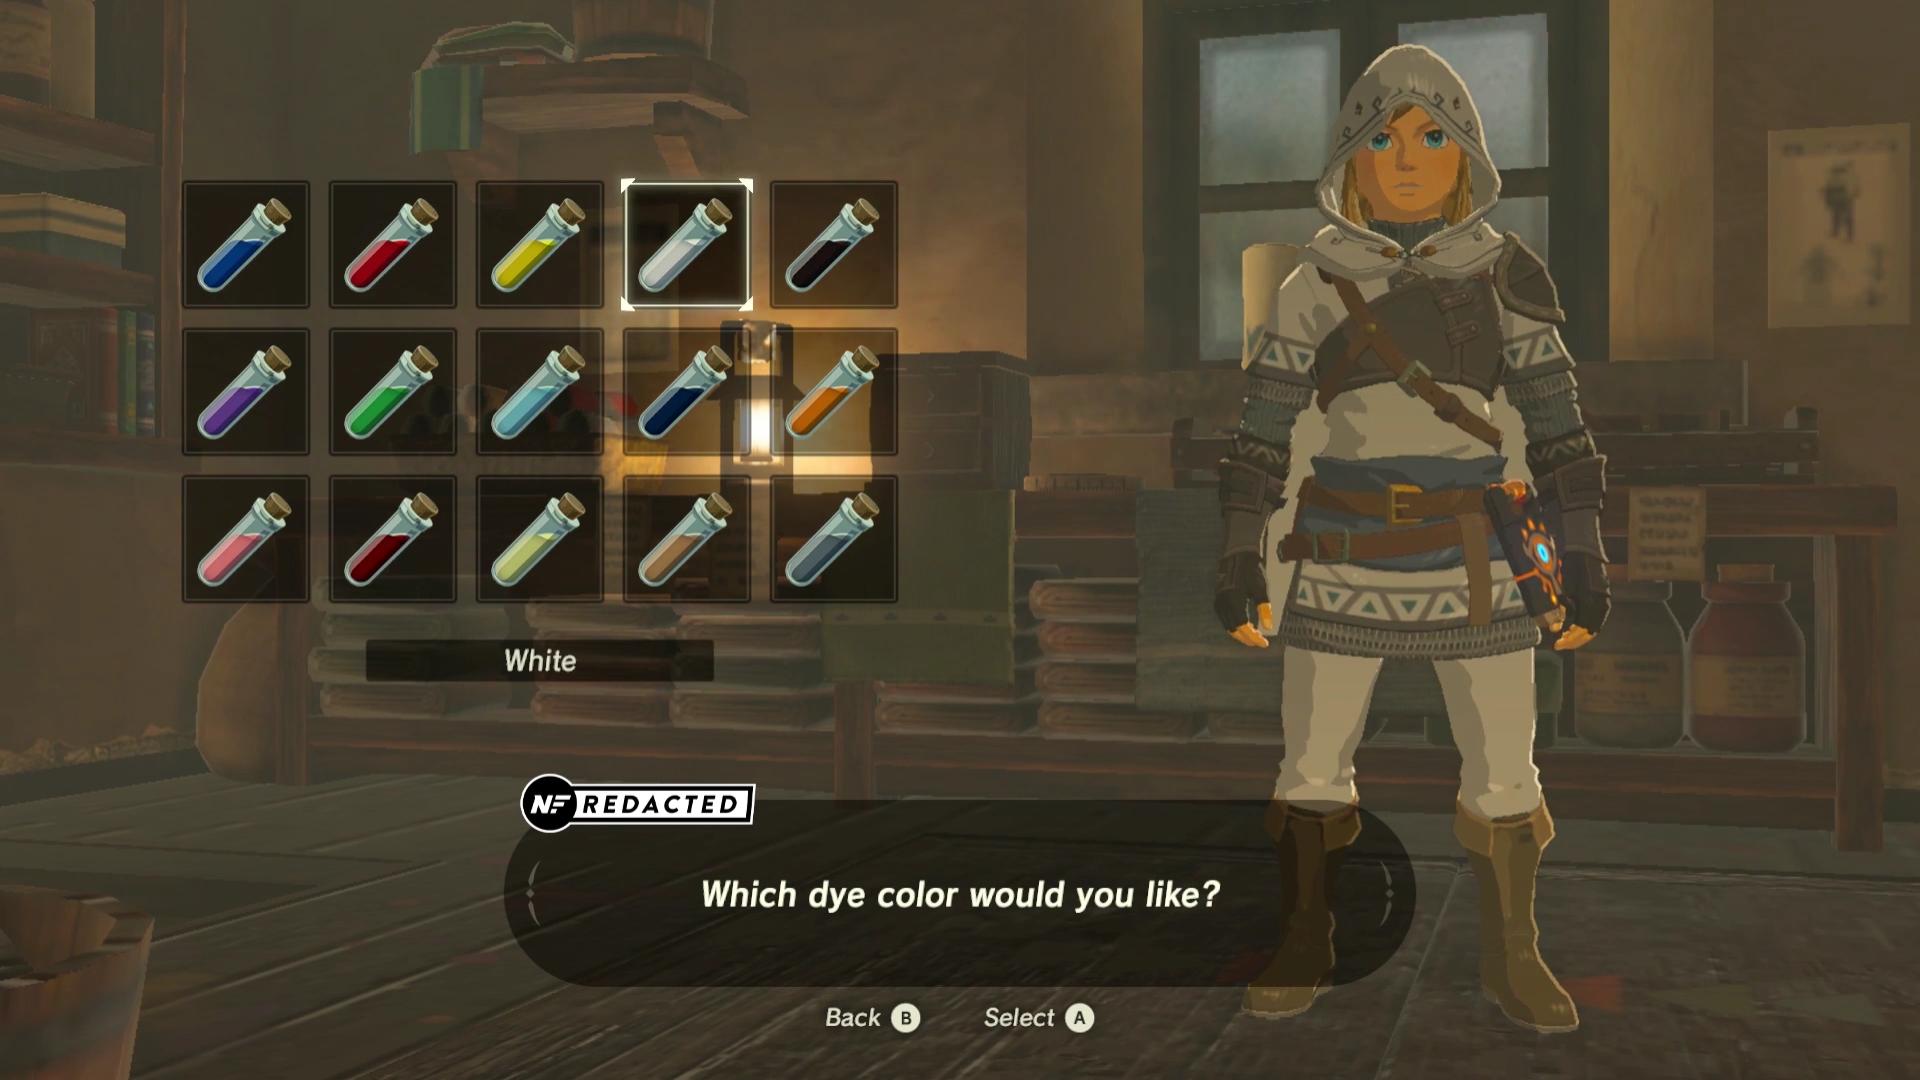 Legend Of Zelda Breath Of The Wild Gets Pirated Days